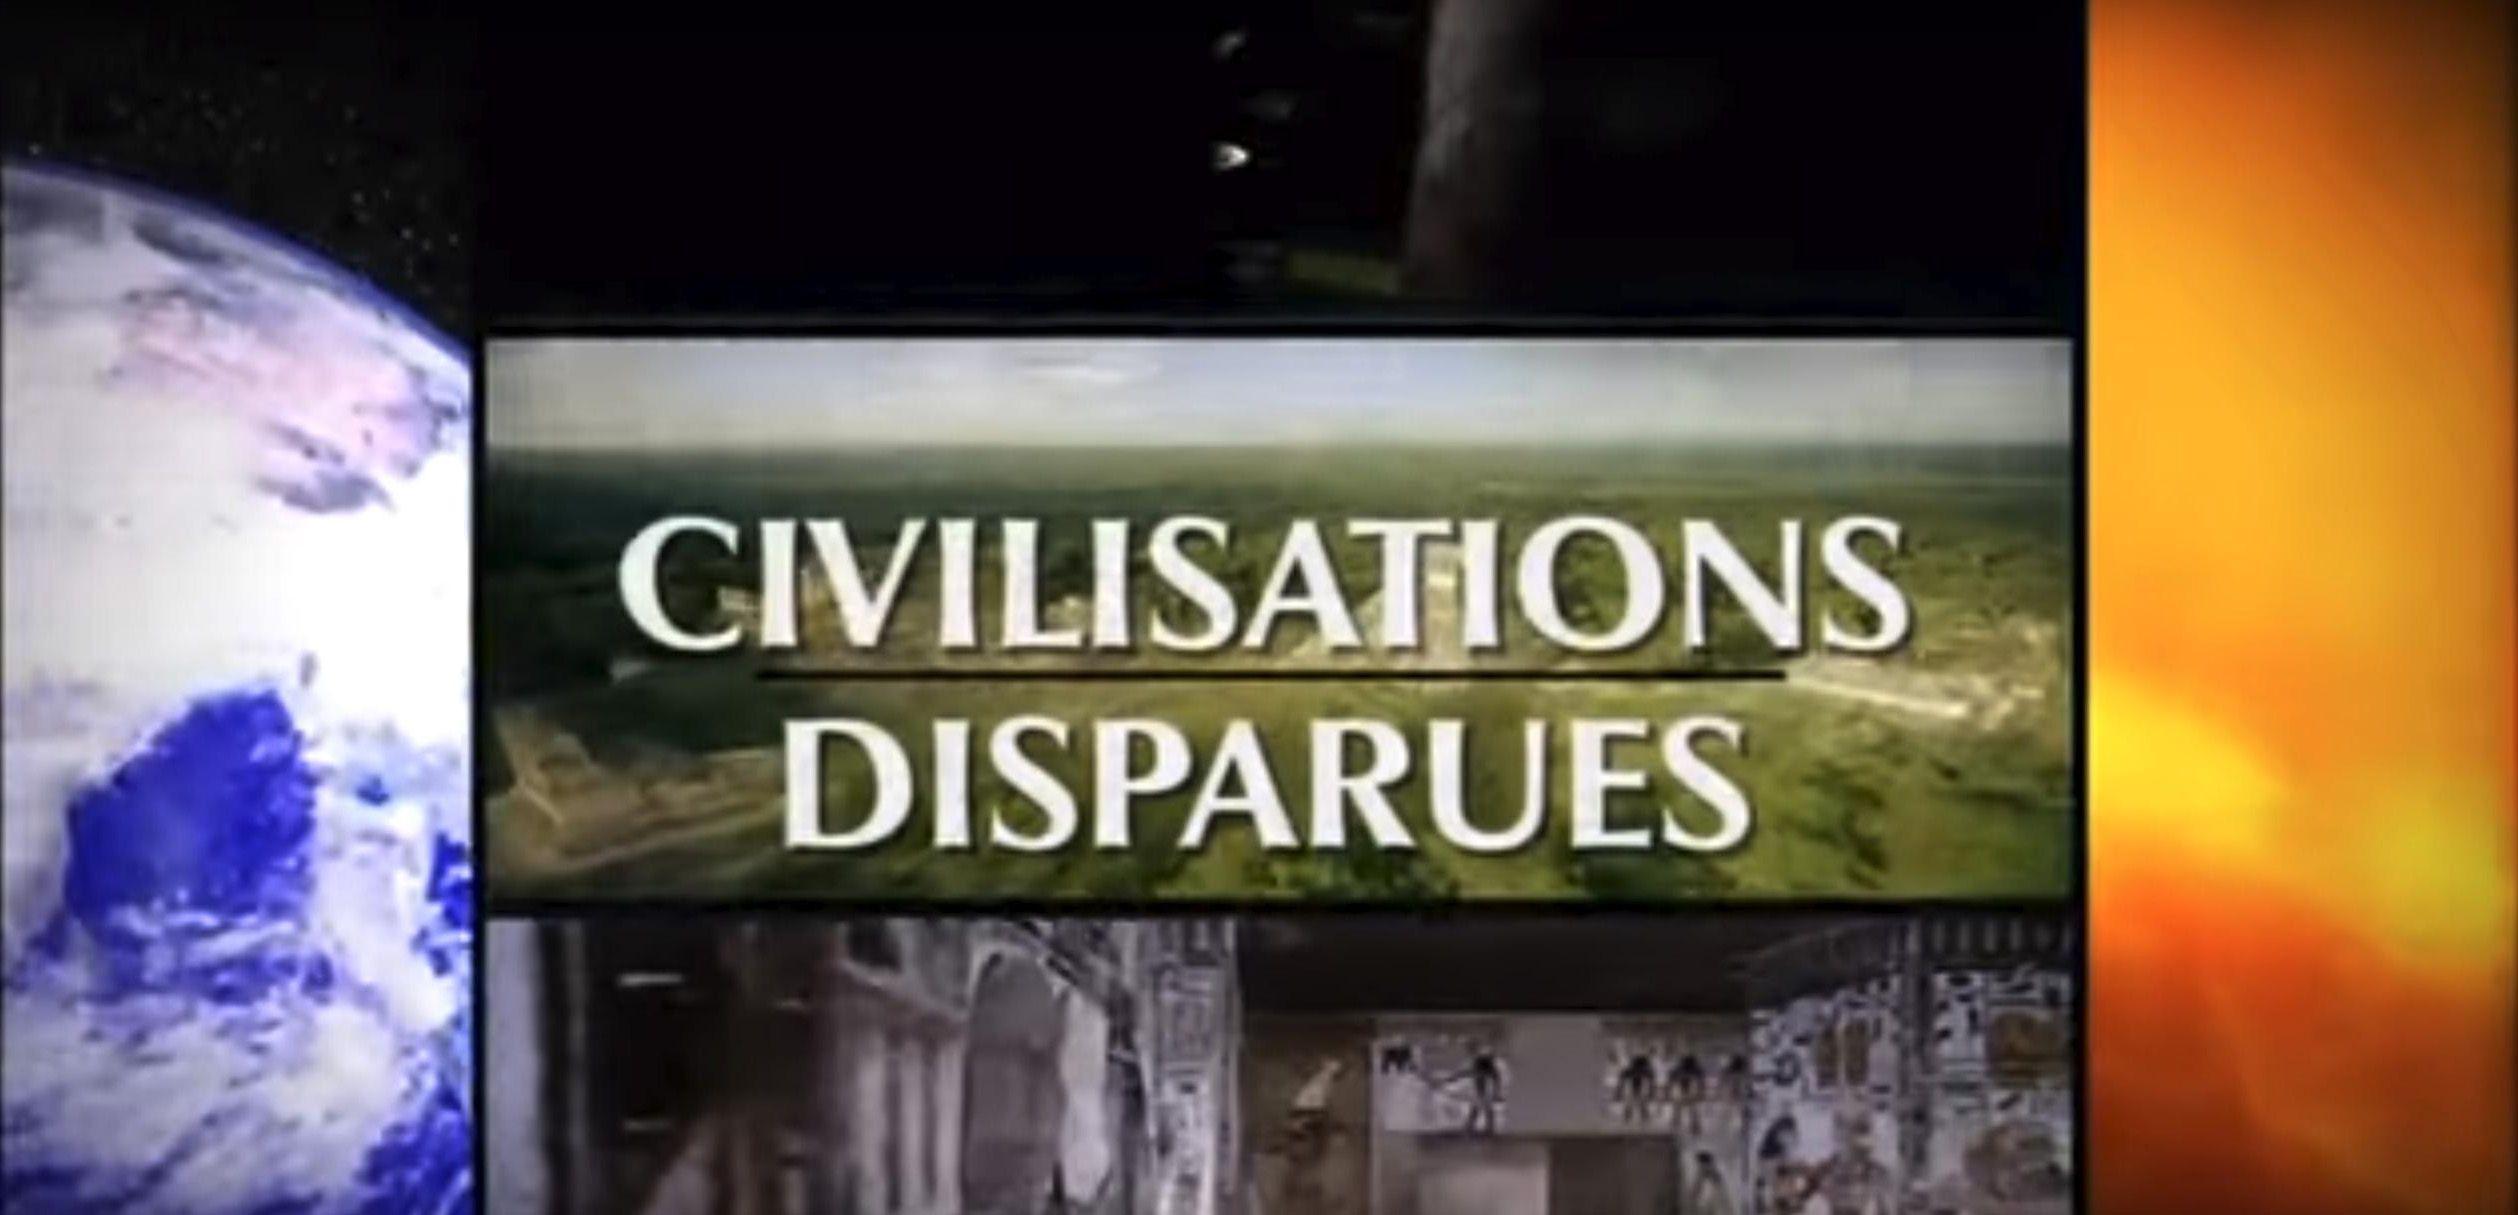 civilisations_disparues.jpg